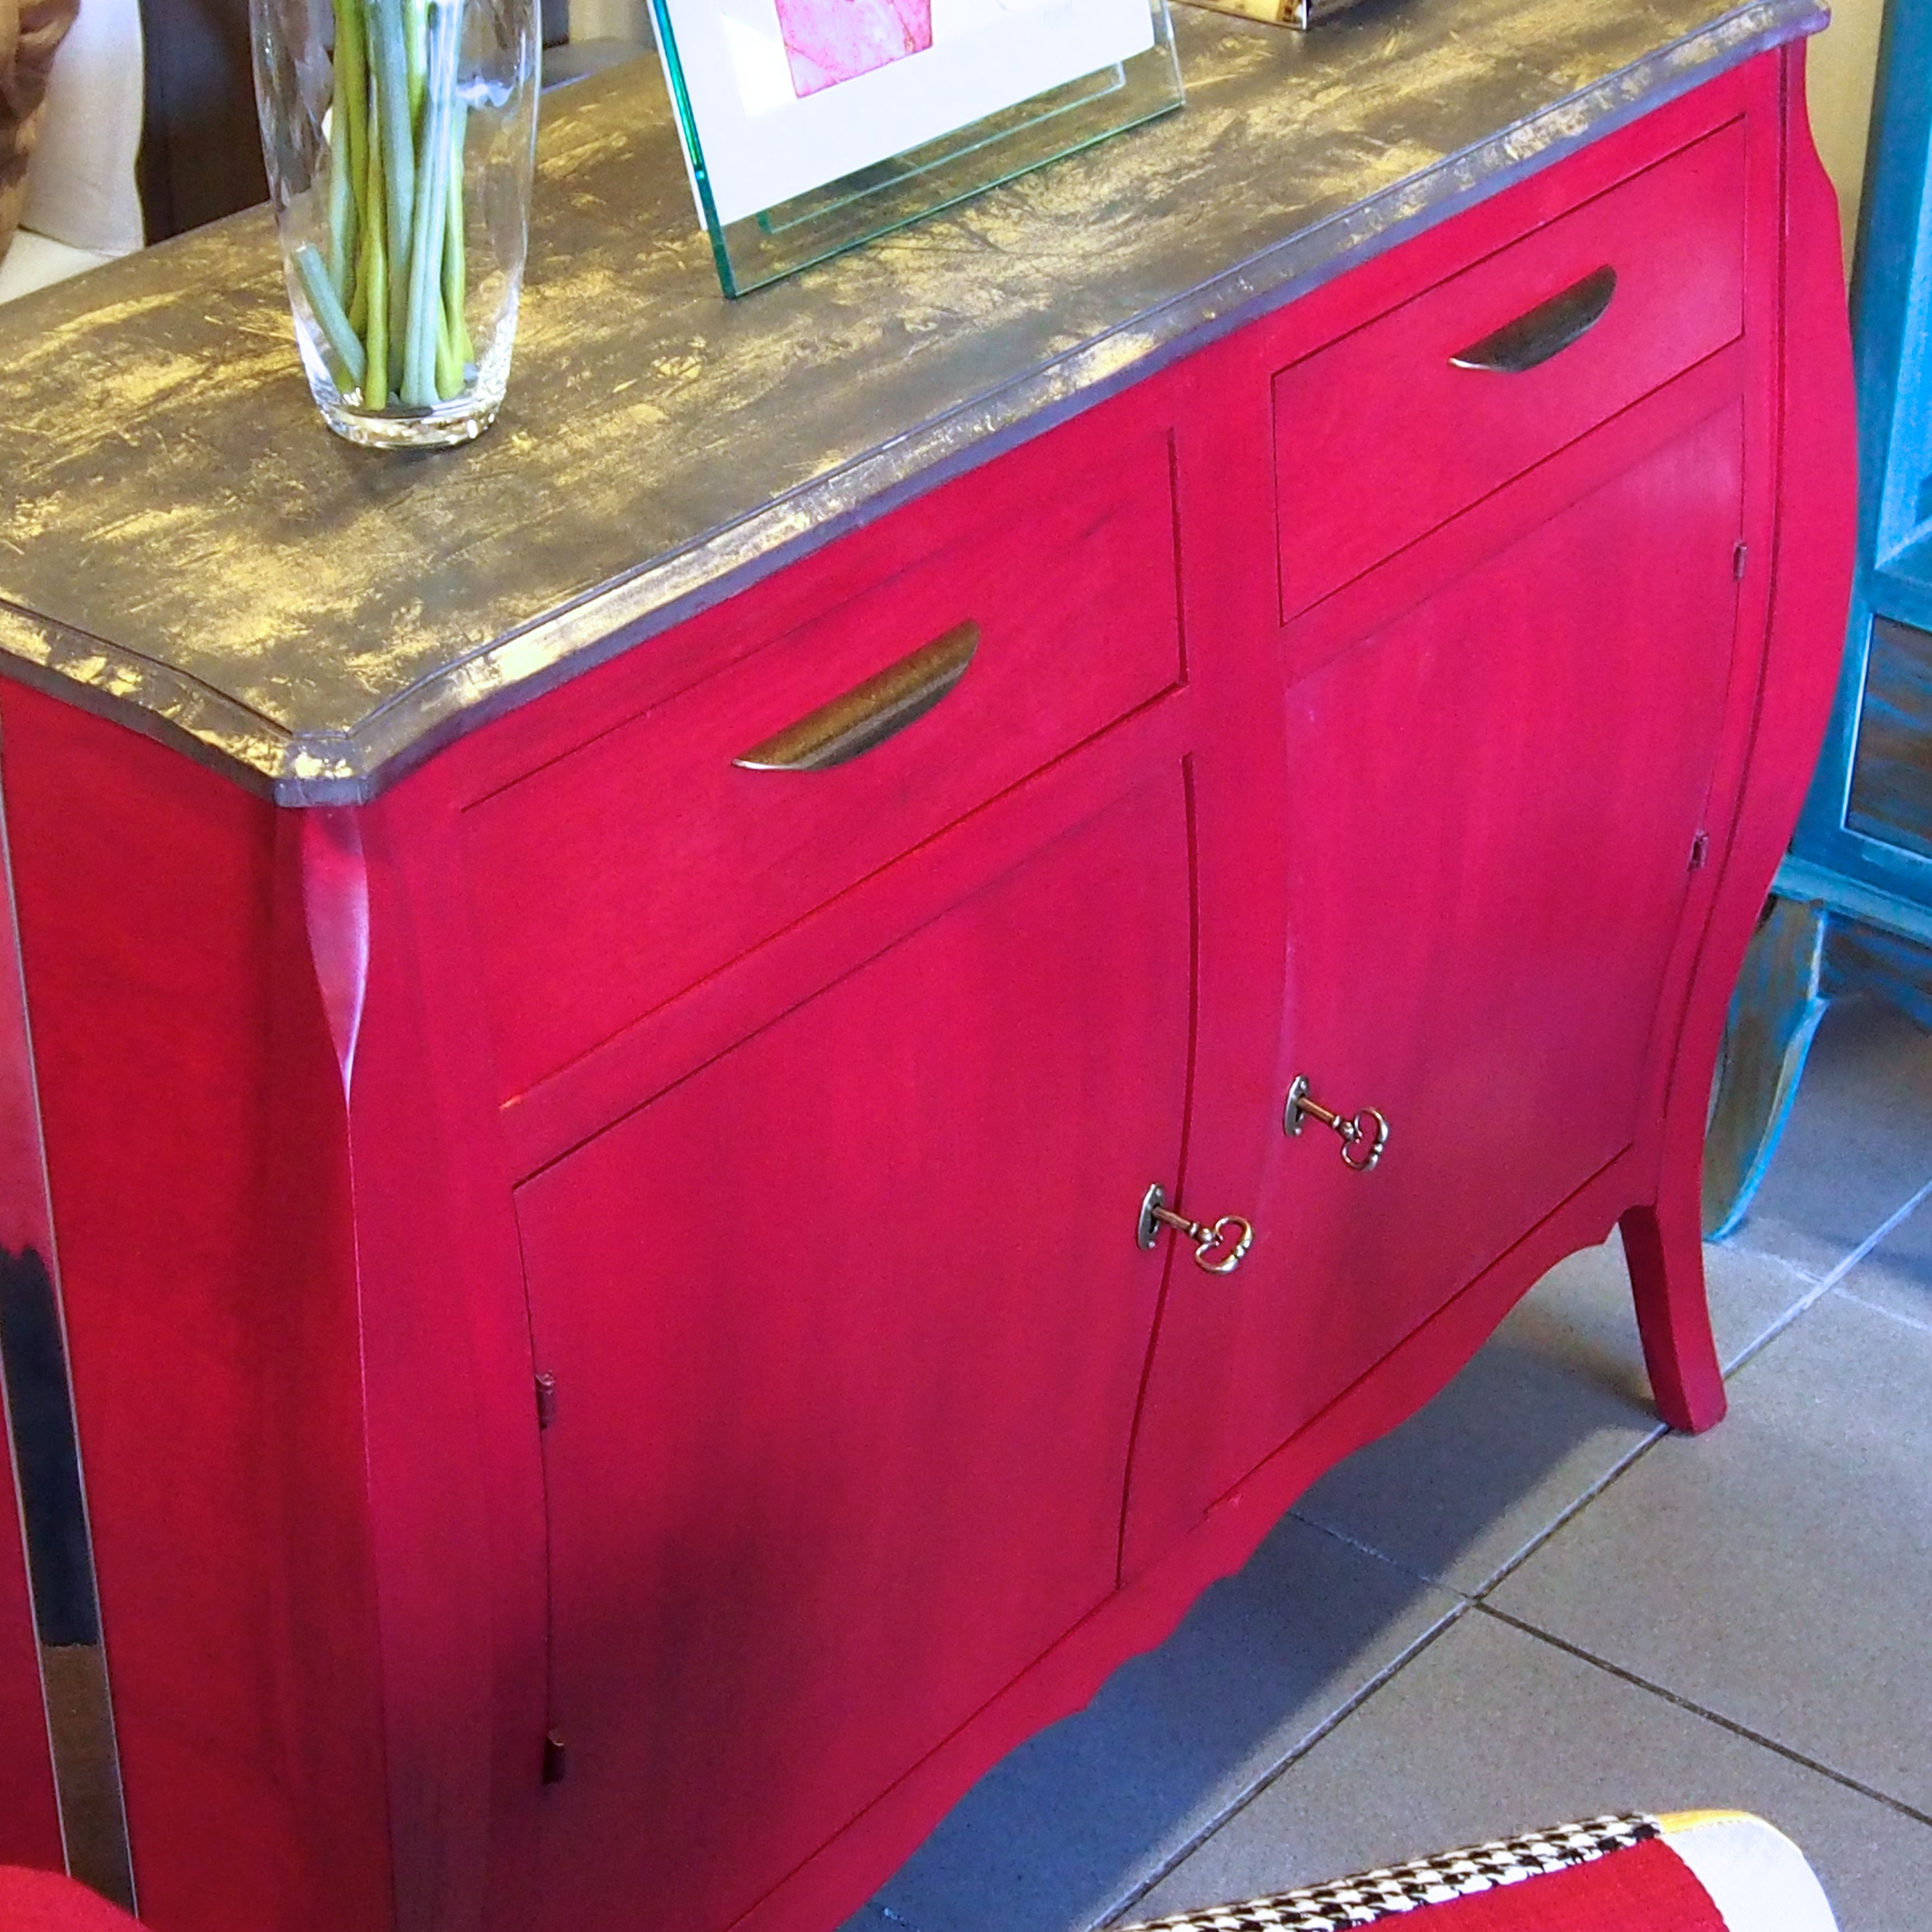 Comoda nueva madera de pino pintada en color rojo vino - Sofas de madera de pino ...